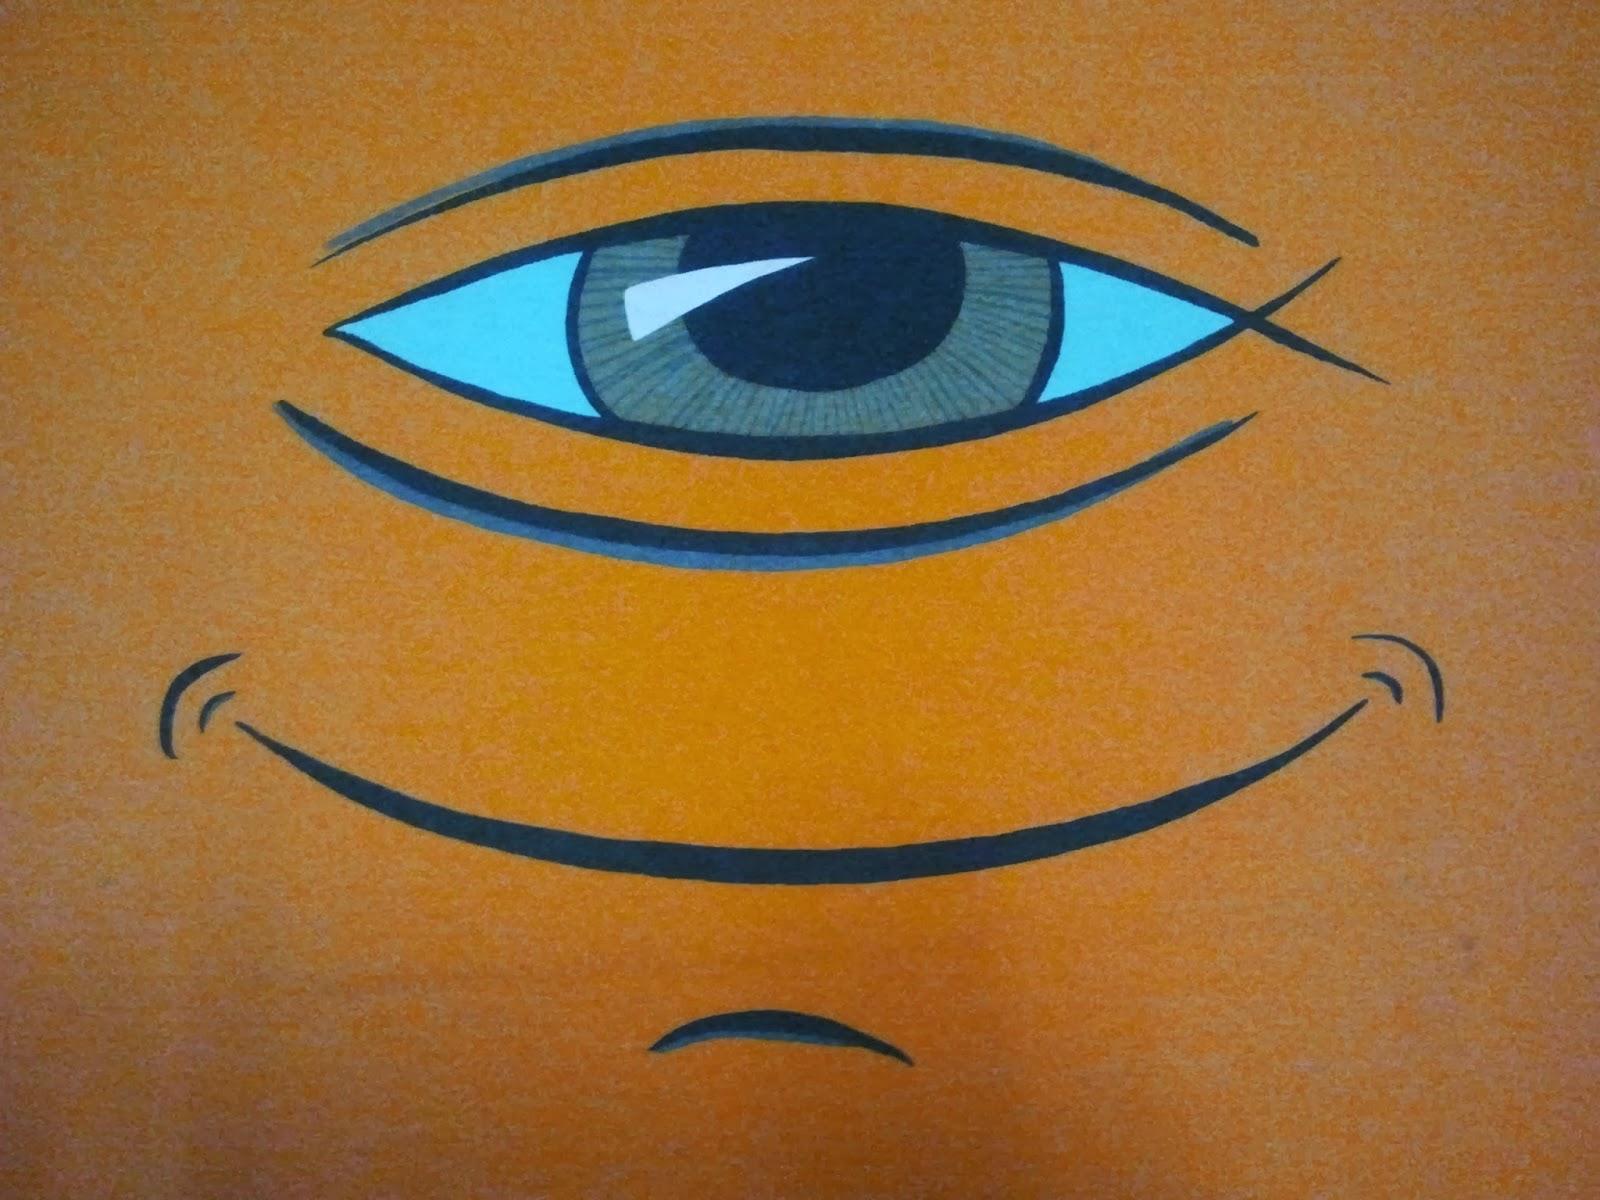 Toy Machine Sect Eye Logo Images Free Download In Stock Deck Orange